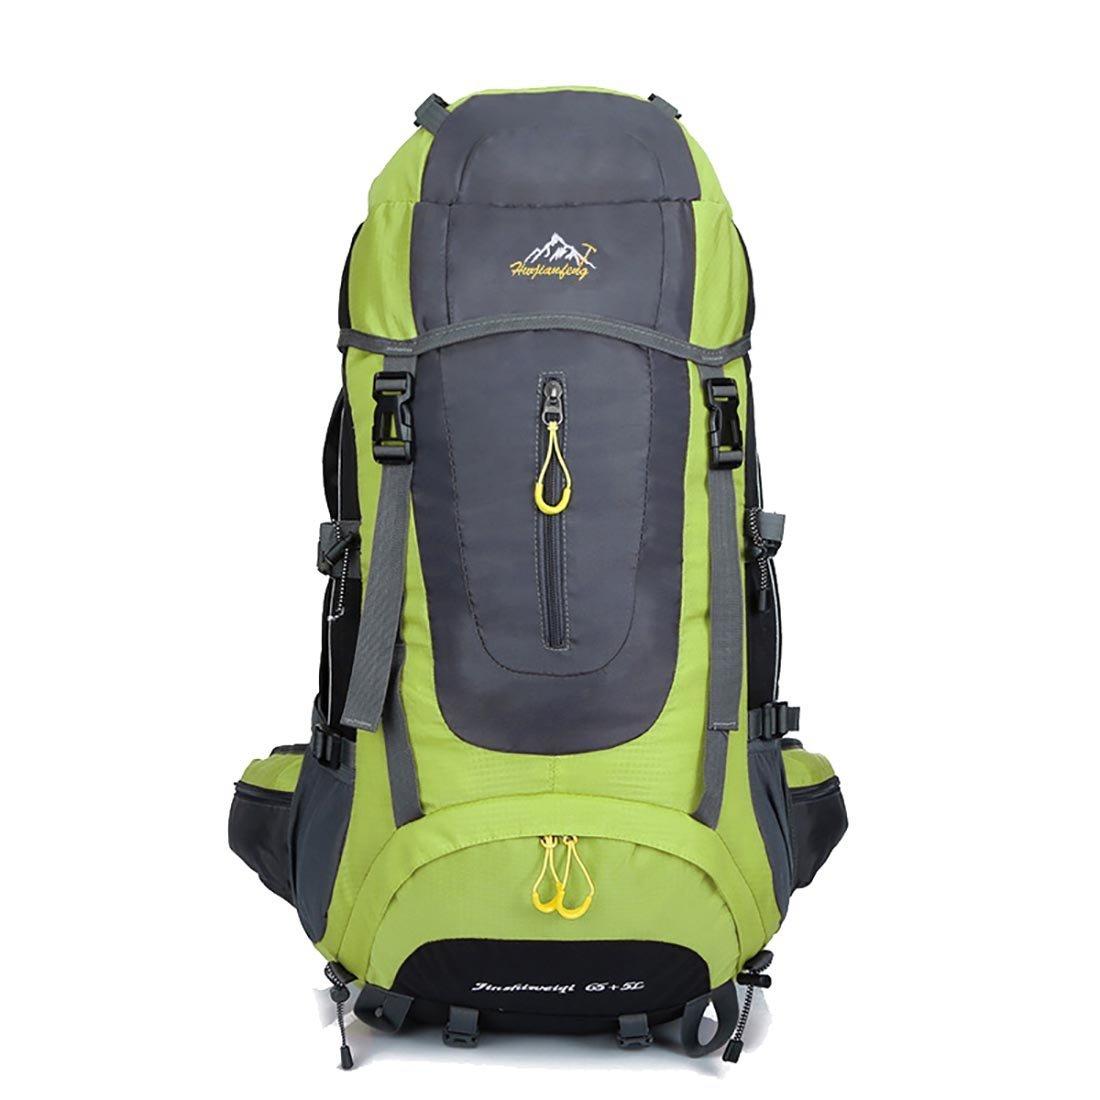 Stimmt Largeハイキングバックパック、65l内部フレームバックパックハイパフォーマンスLargeバックパックメンズレディース登山バッグハンティングバッグ  グリーン B07G4F5878